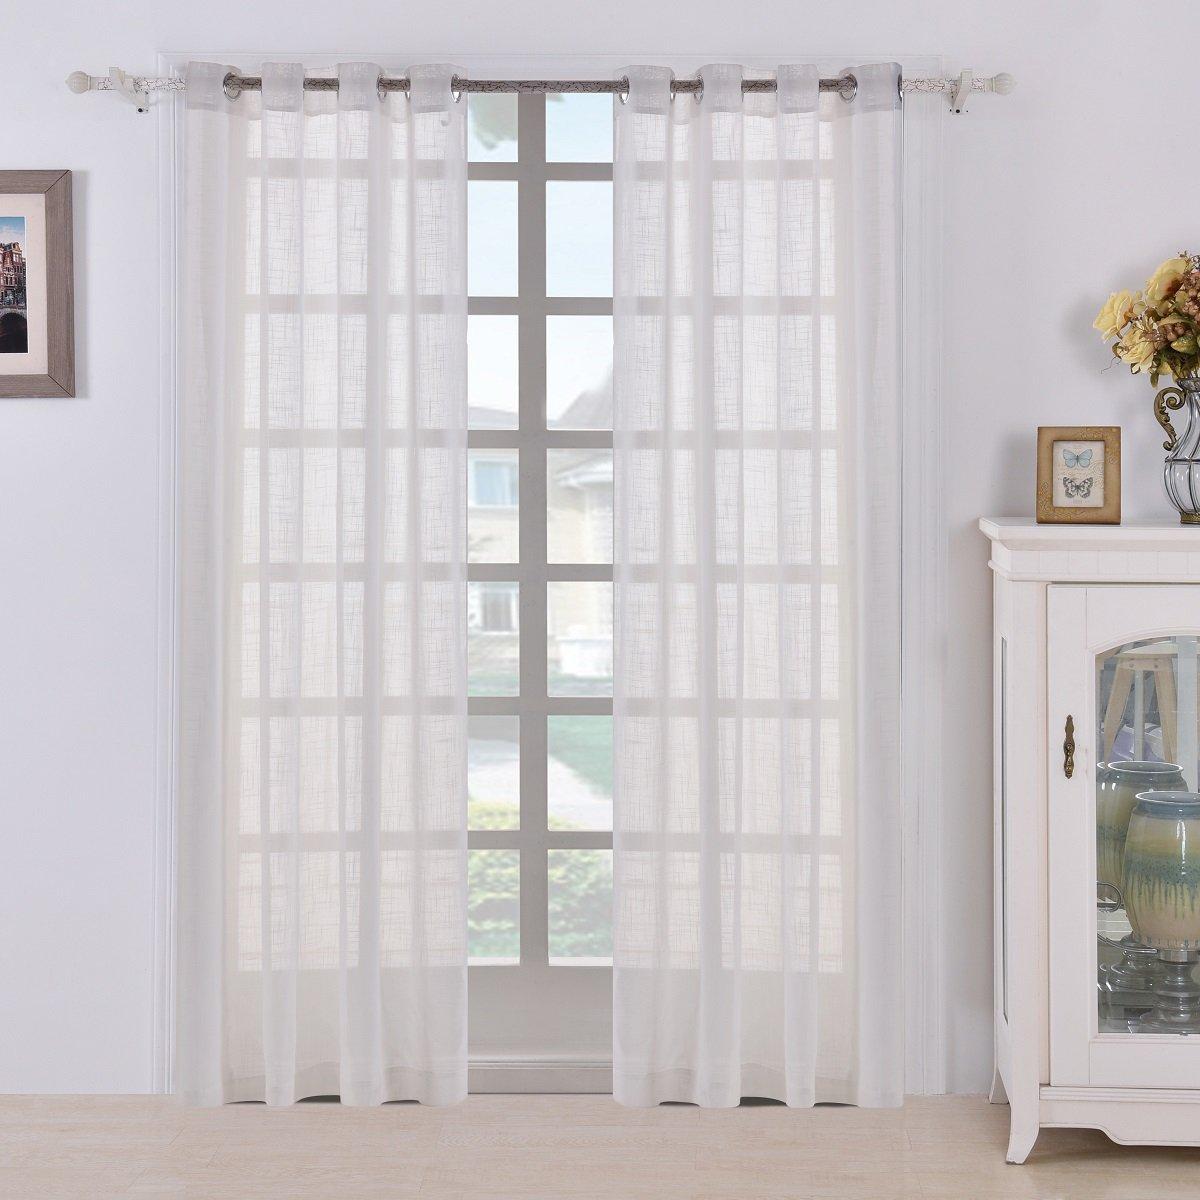 White Linen Curtain Panels: Amazon.com